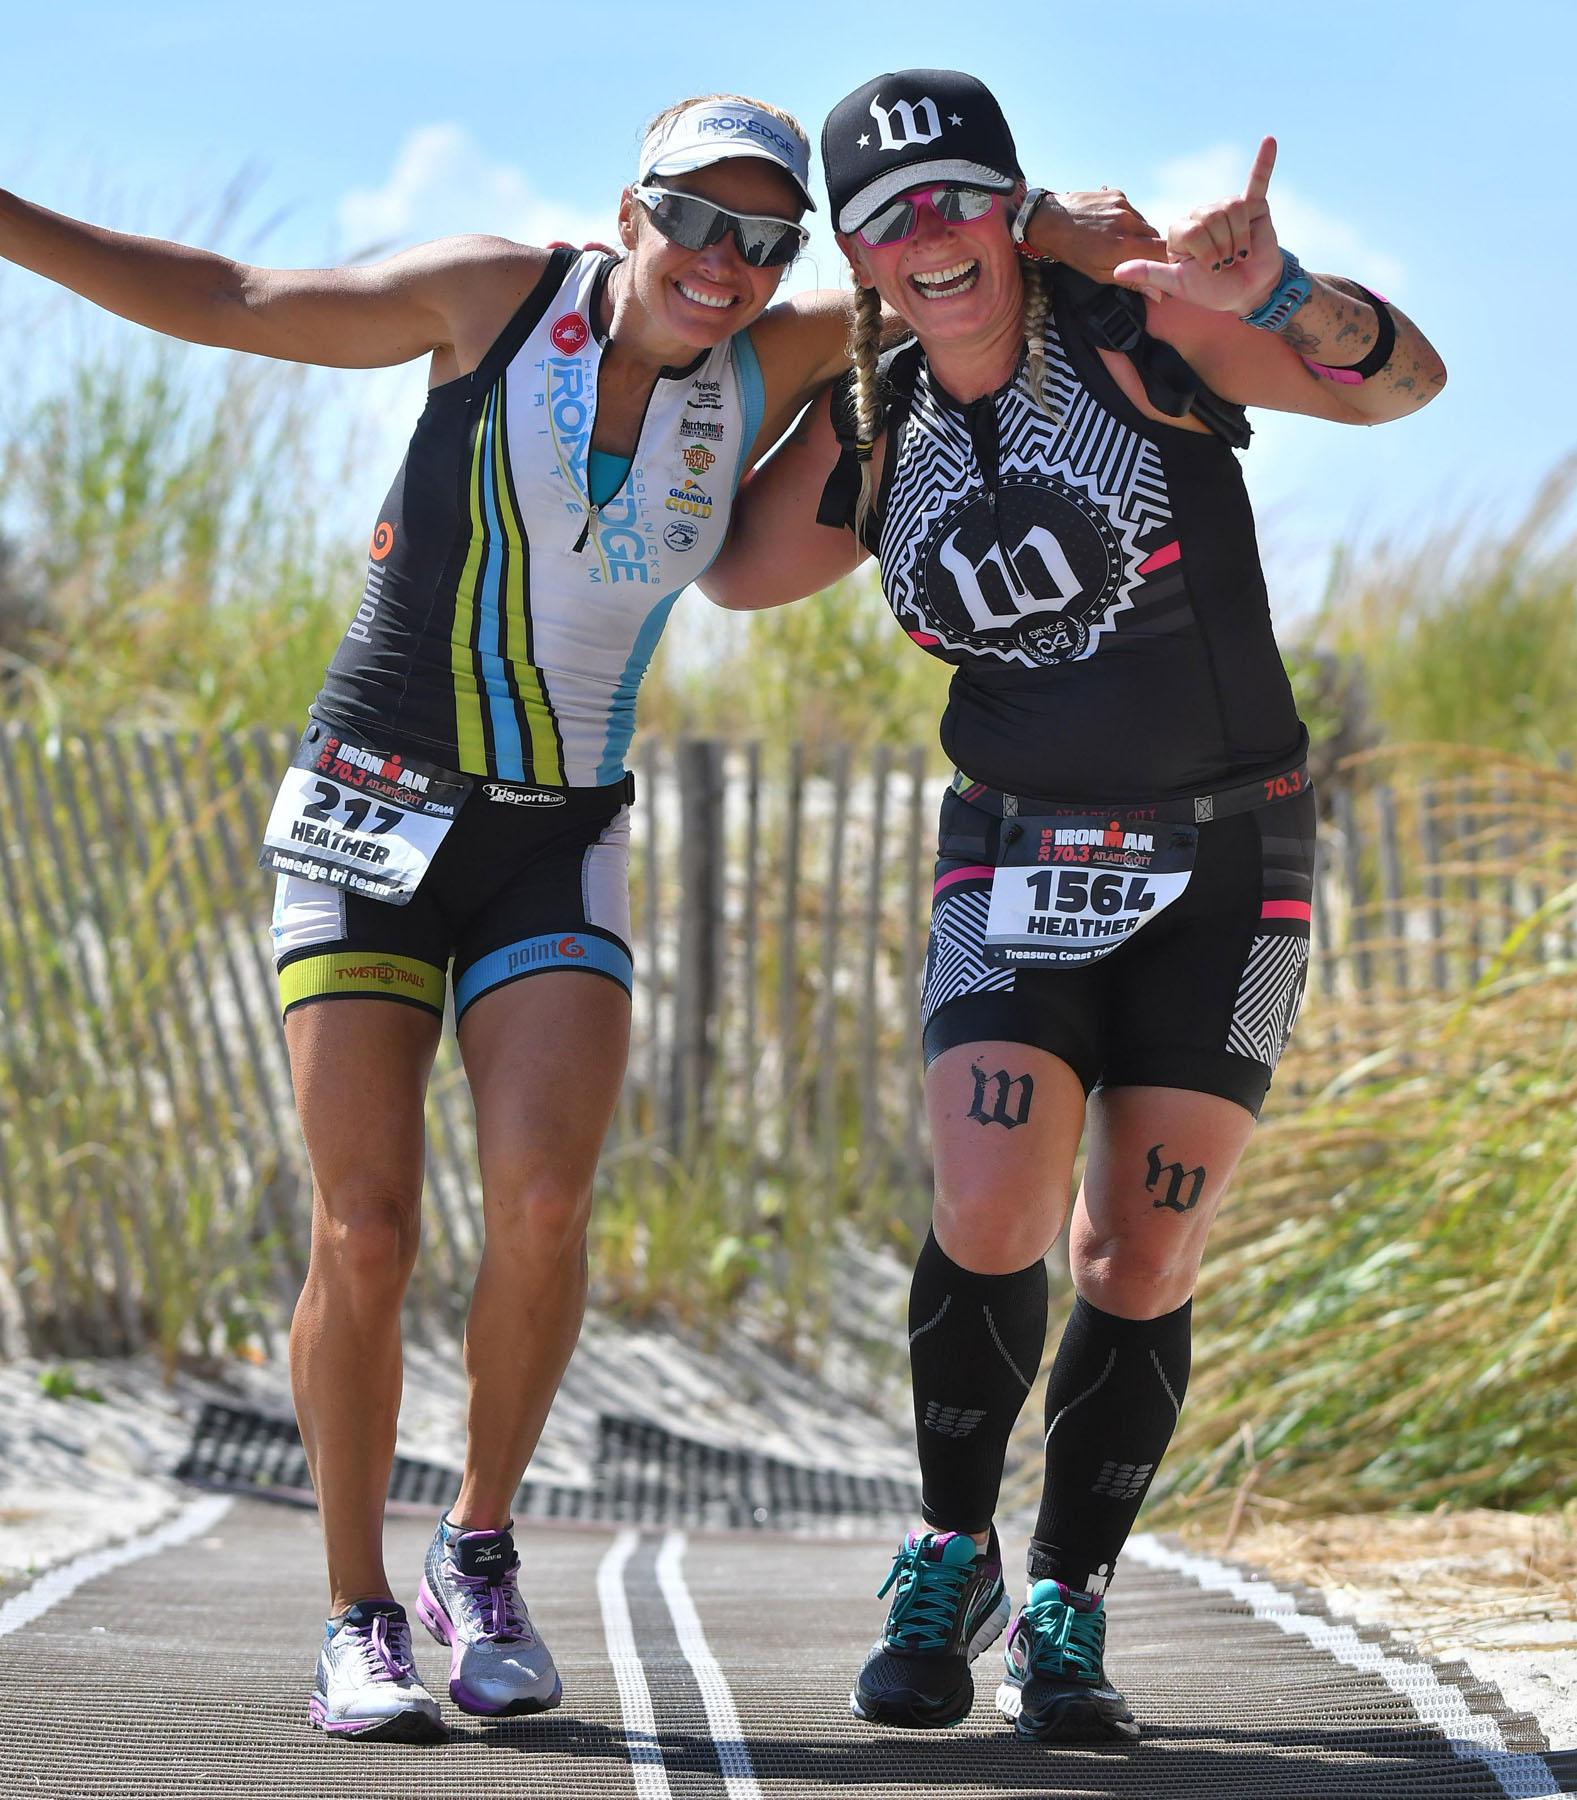 heather gollnick & W tatoo - Ironman 70.3 Atlantic City